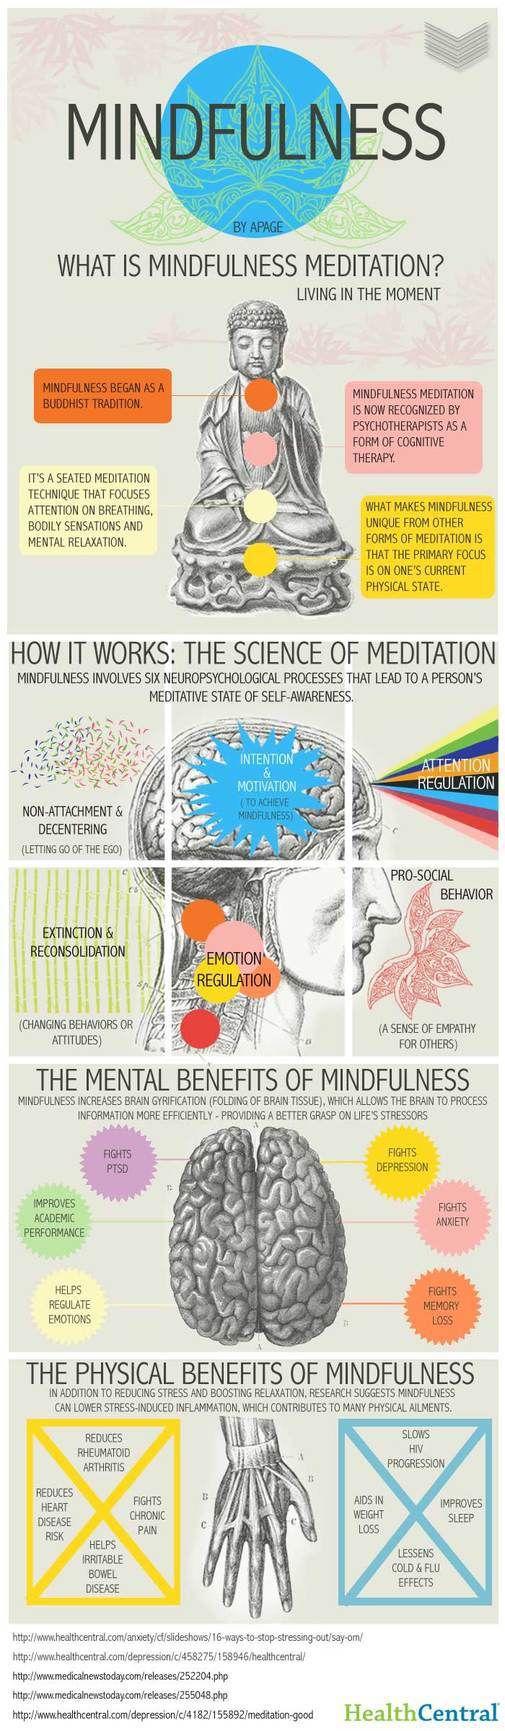 Beautiful #infographic on #mindfulness.